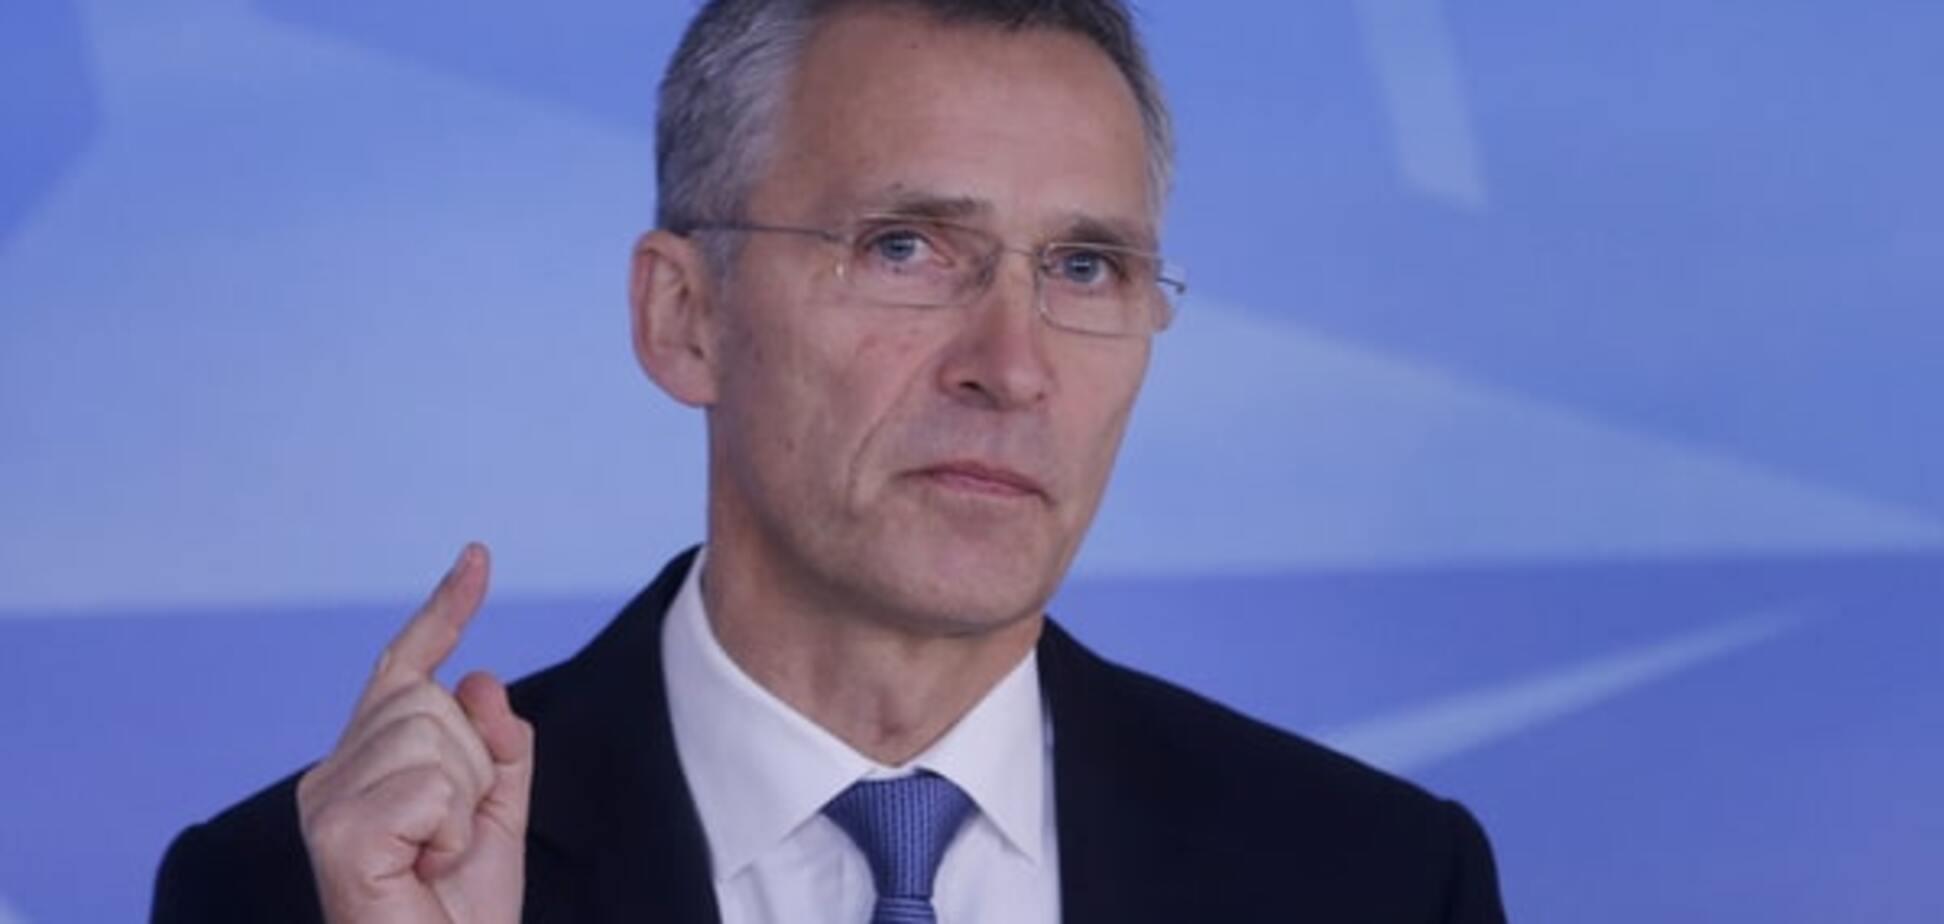 НАТО дав Путіну чіткий сигнал - The Times